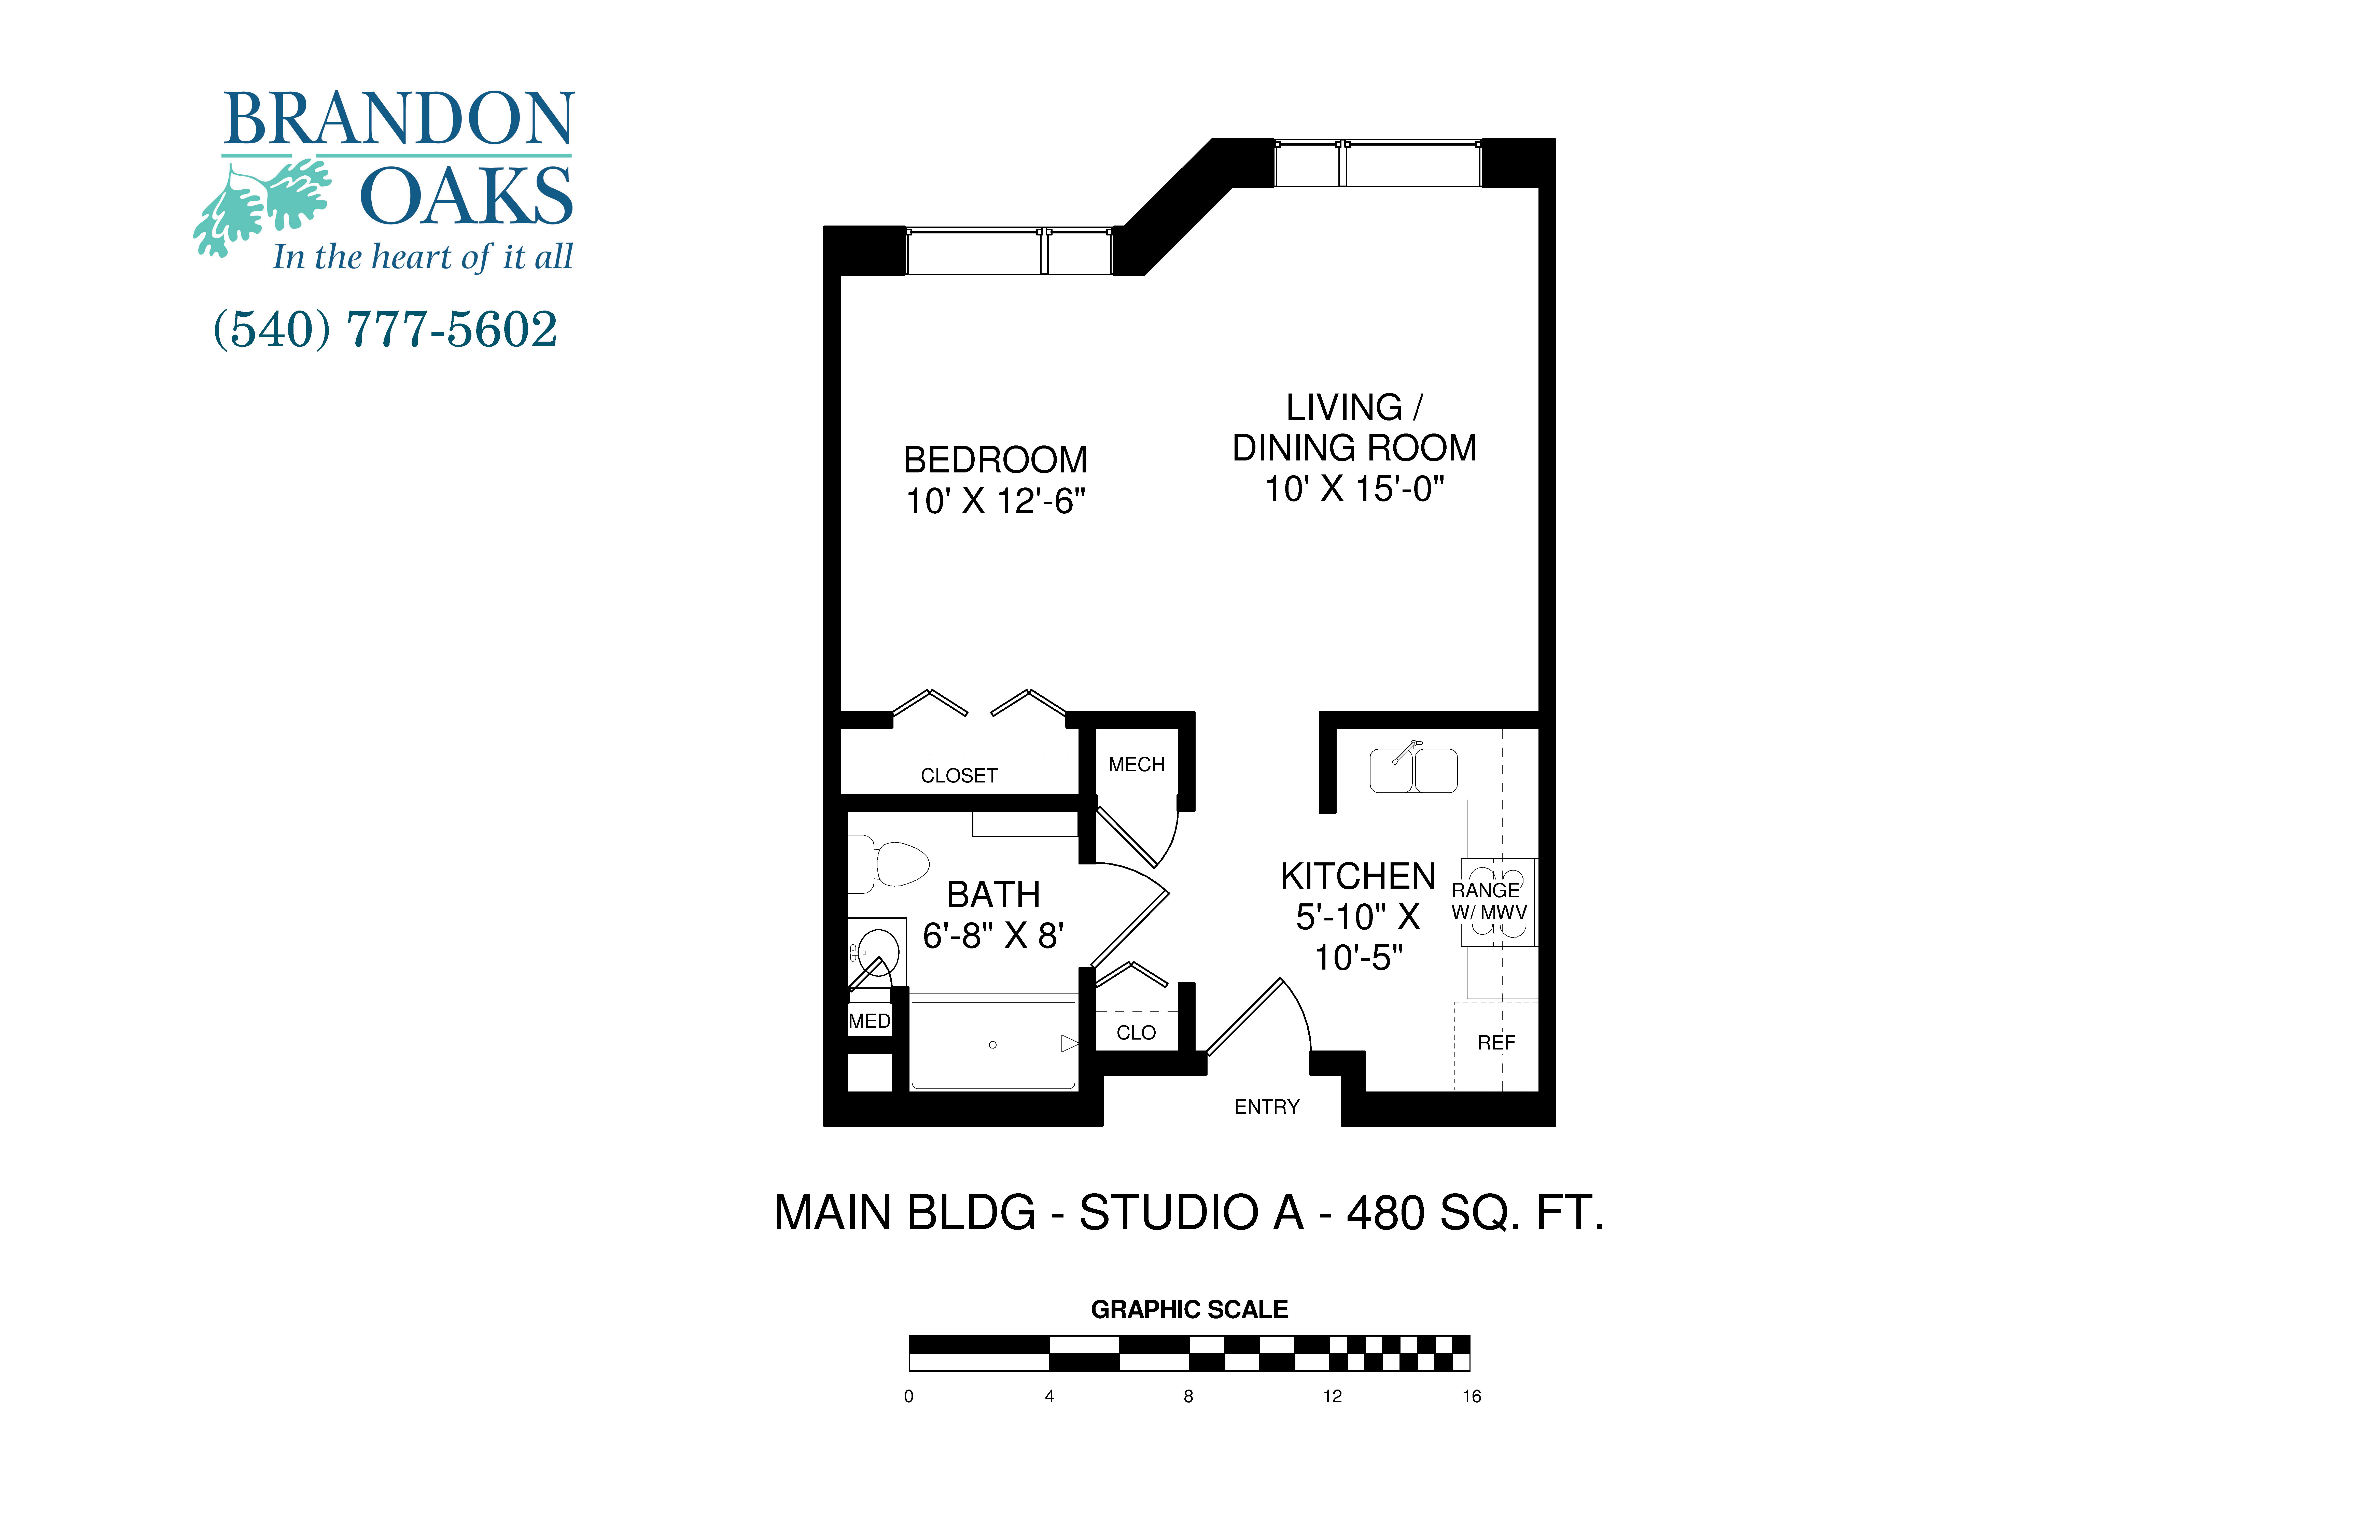 Studio Apartment Floor Plans 480 Sq Ft main building apartments | brandon oaks